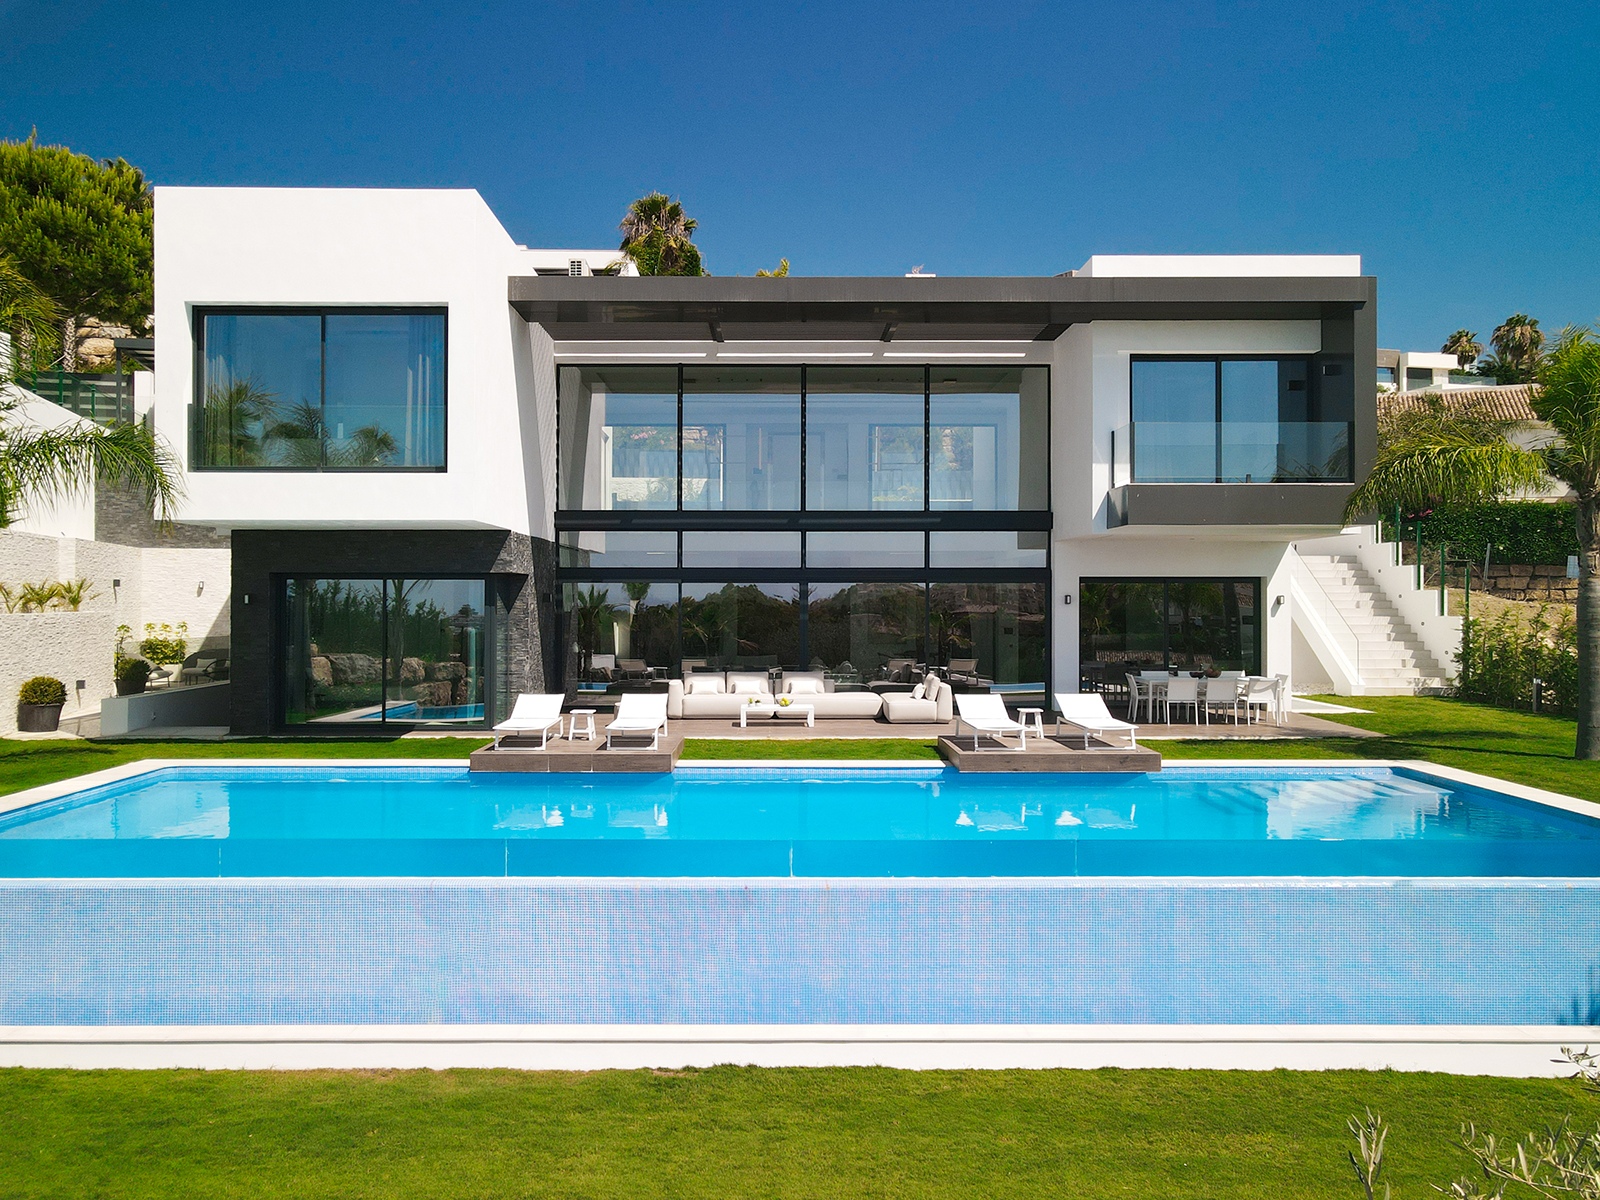 Impresionante villa de lujo a estrenar en Benahavis